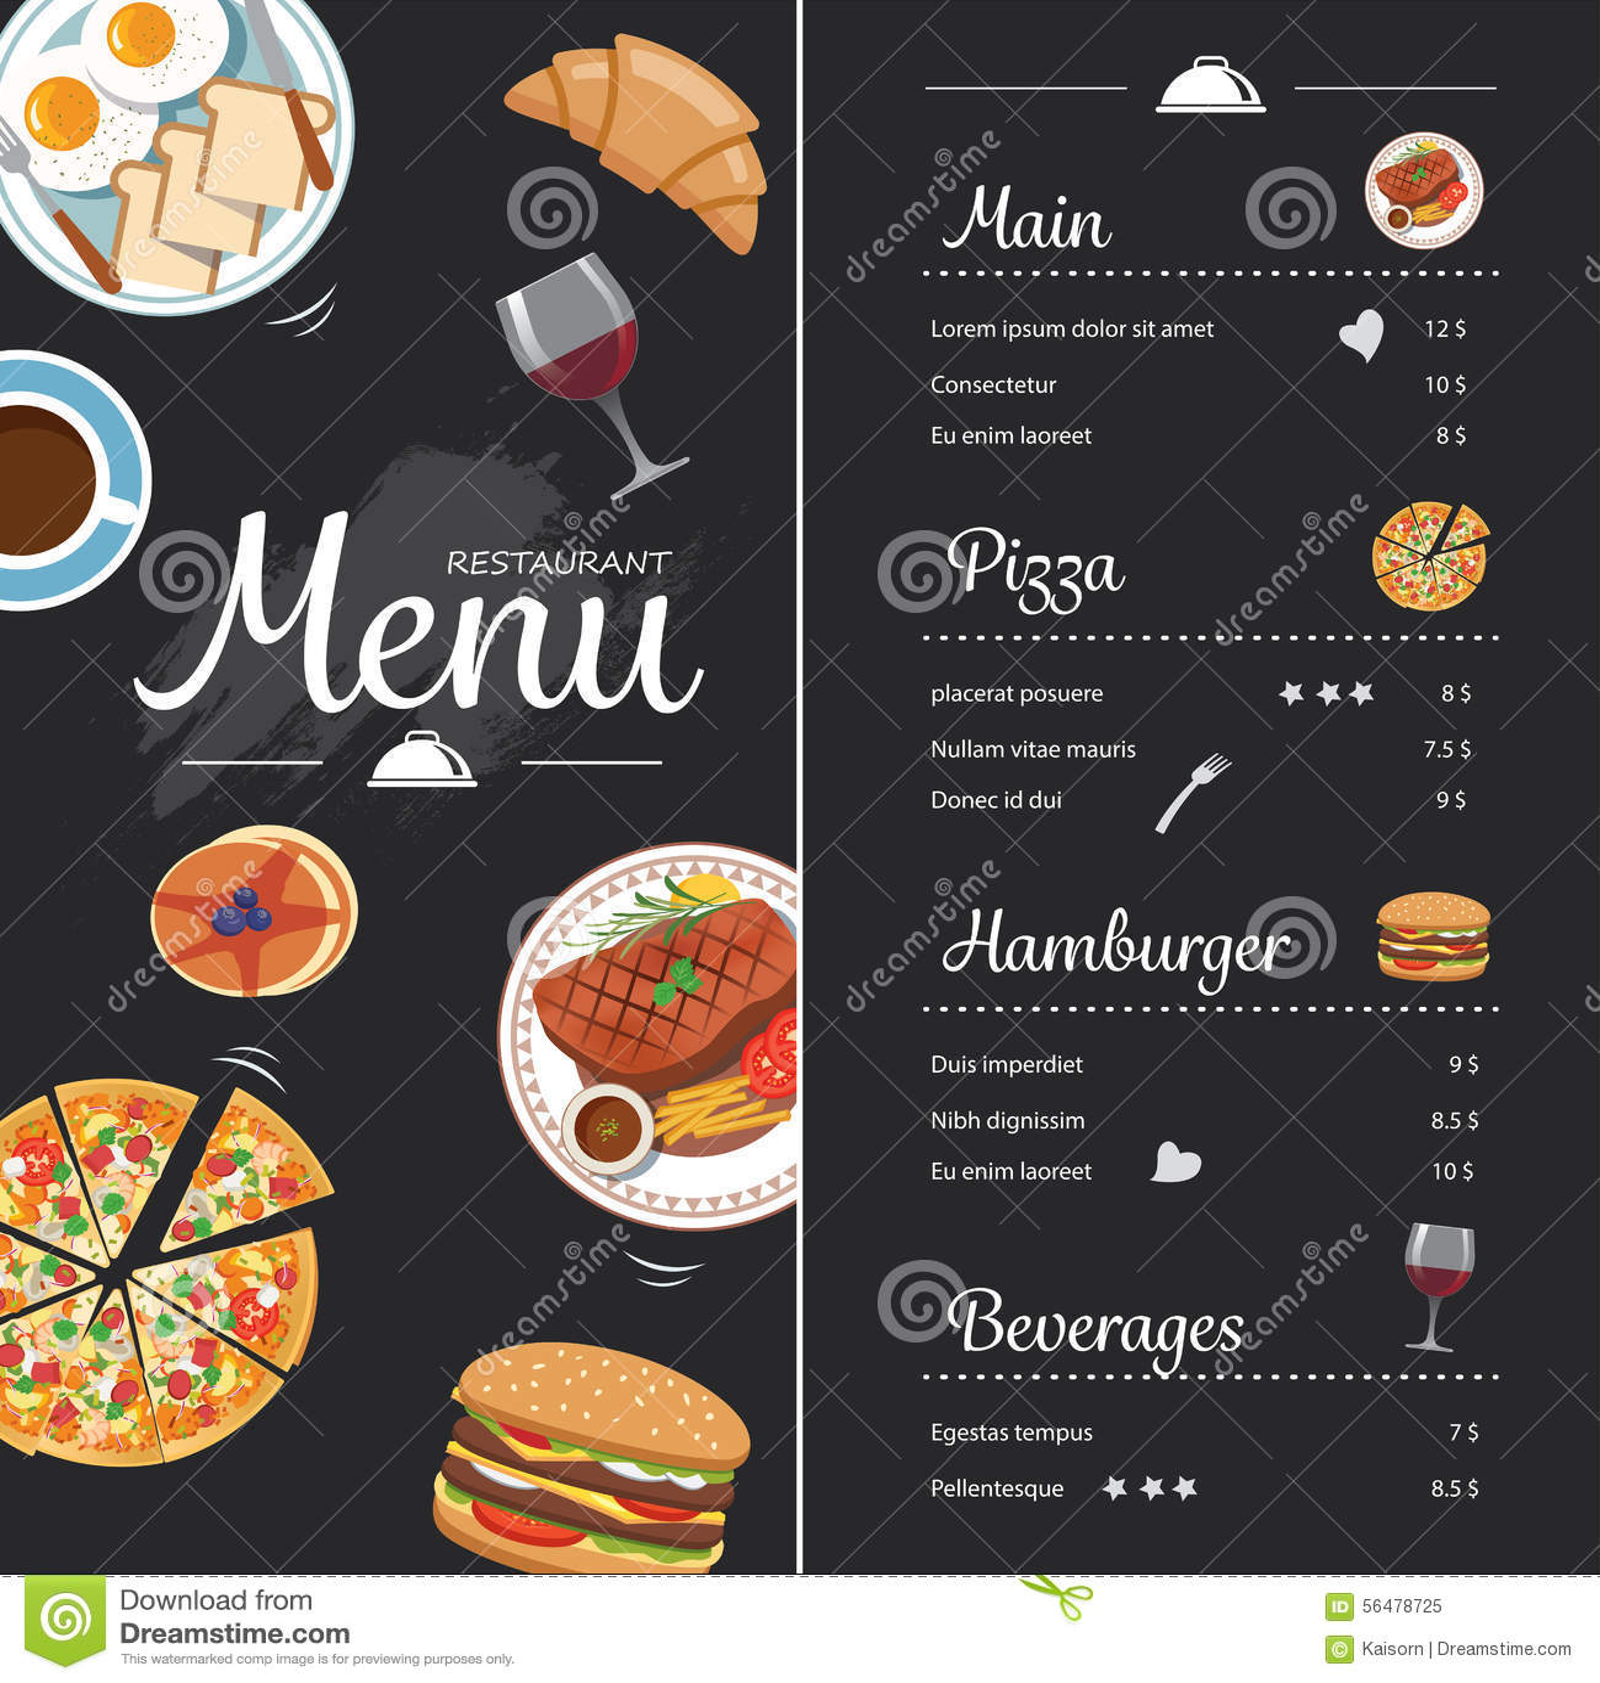 Restaurant Food Menu Design With Chalkboard Stock Vector